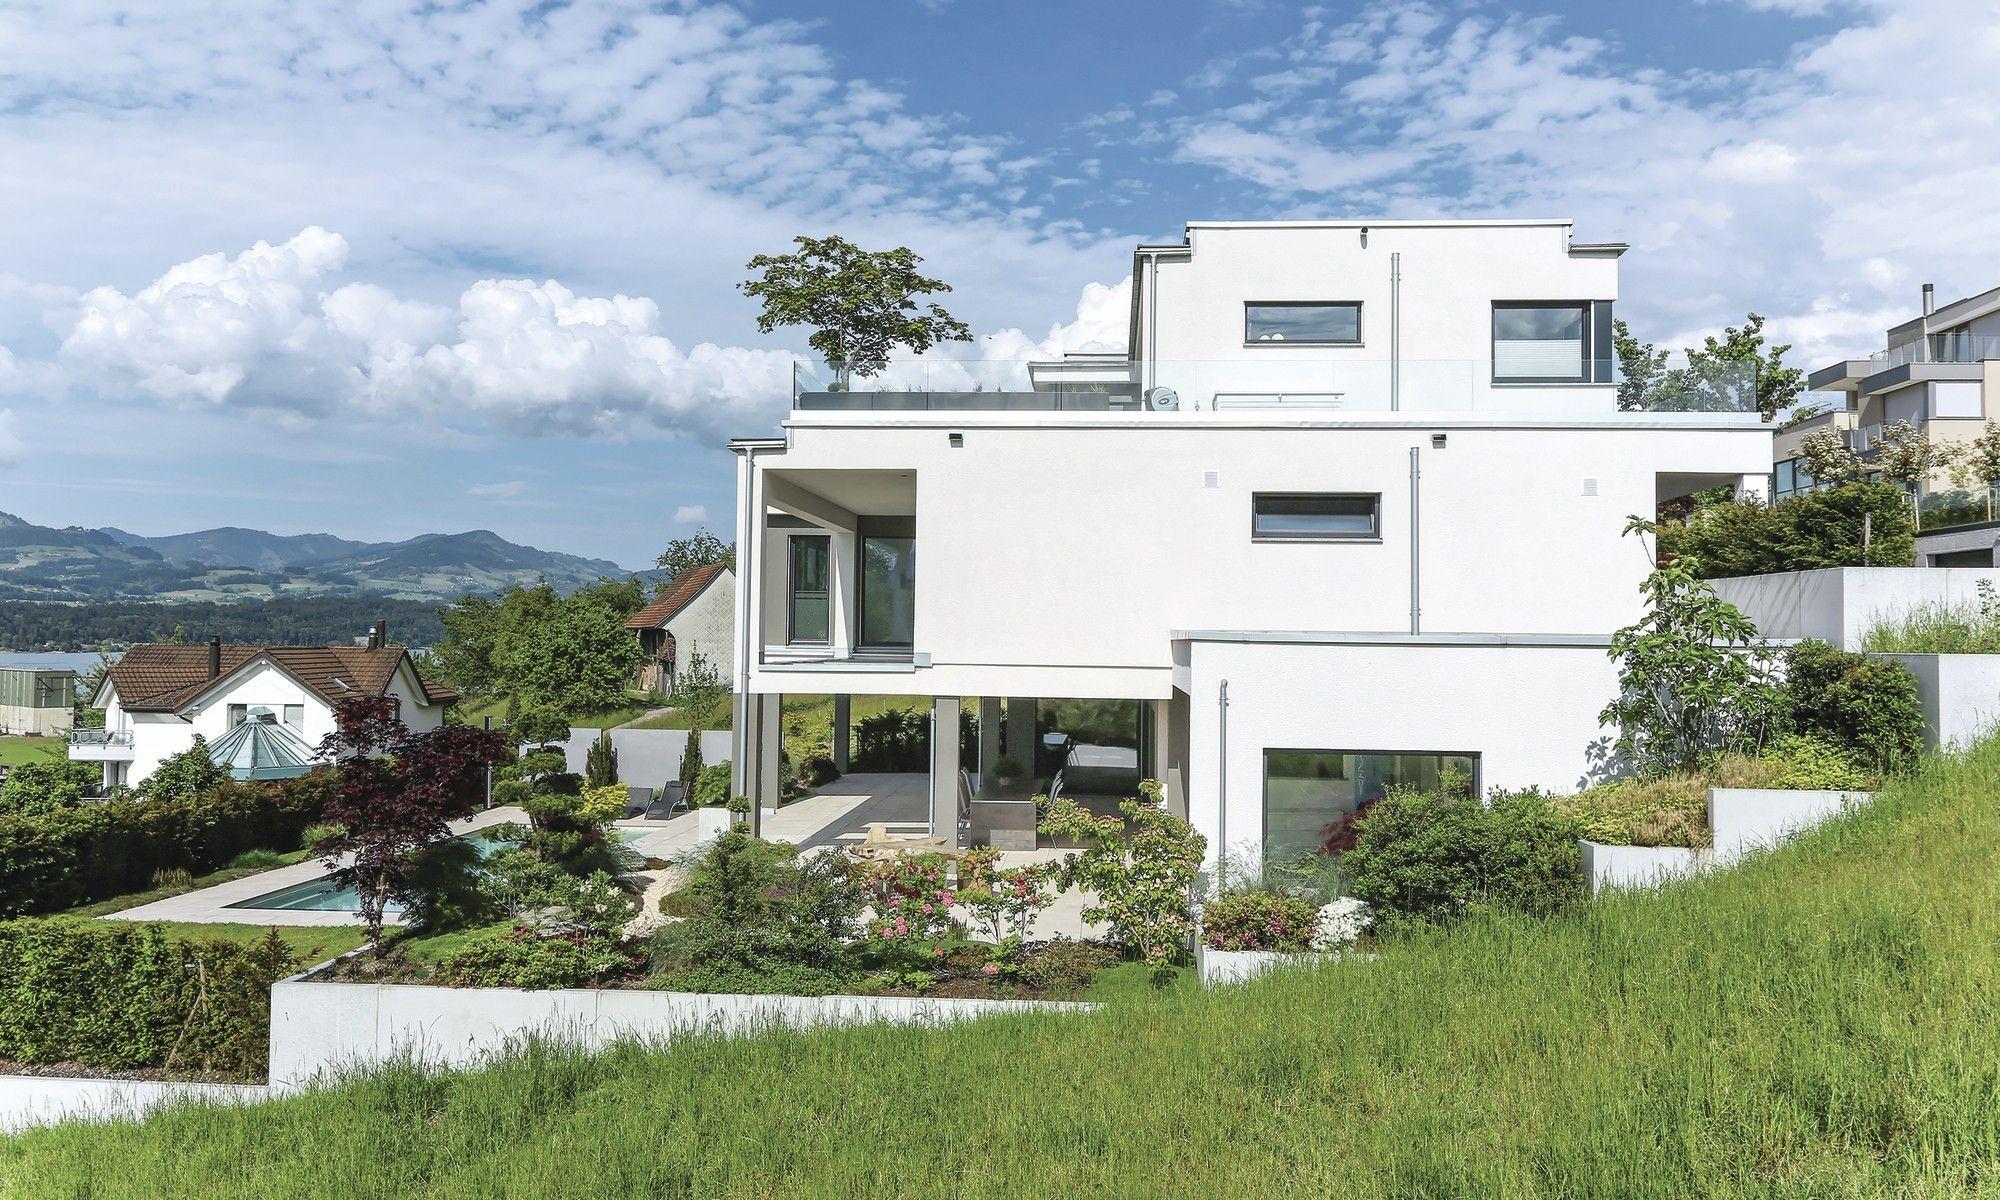 Günstige Fertighäuser Schweiz fertighaus weberhaus holzbauweise villa pool lakelucerne